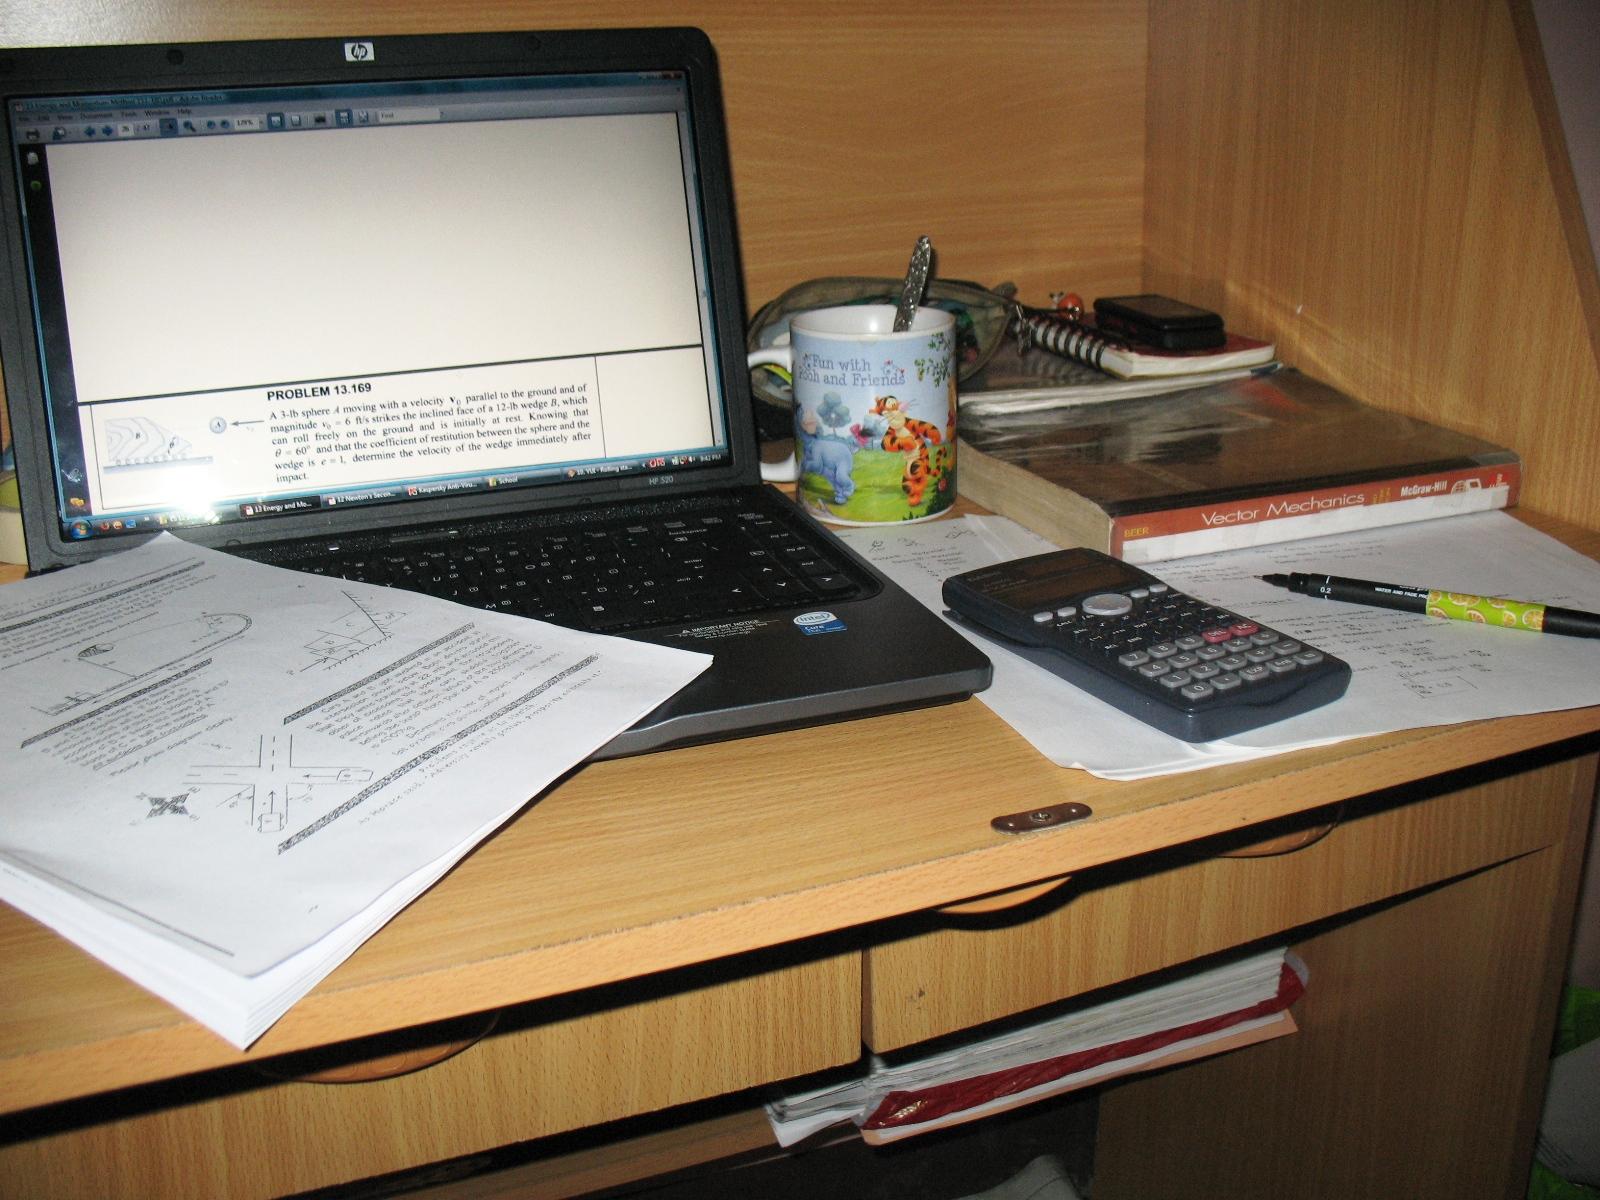 Example essay story spm image 2